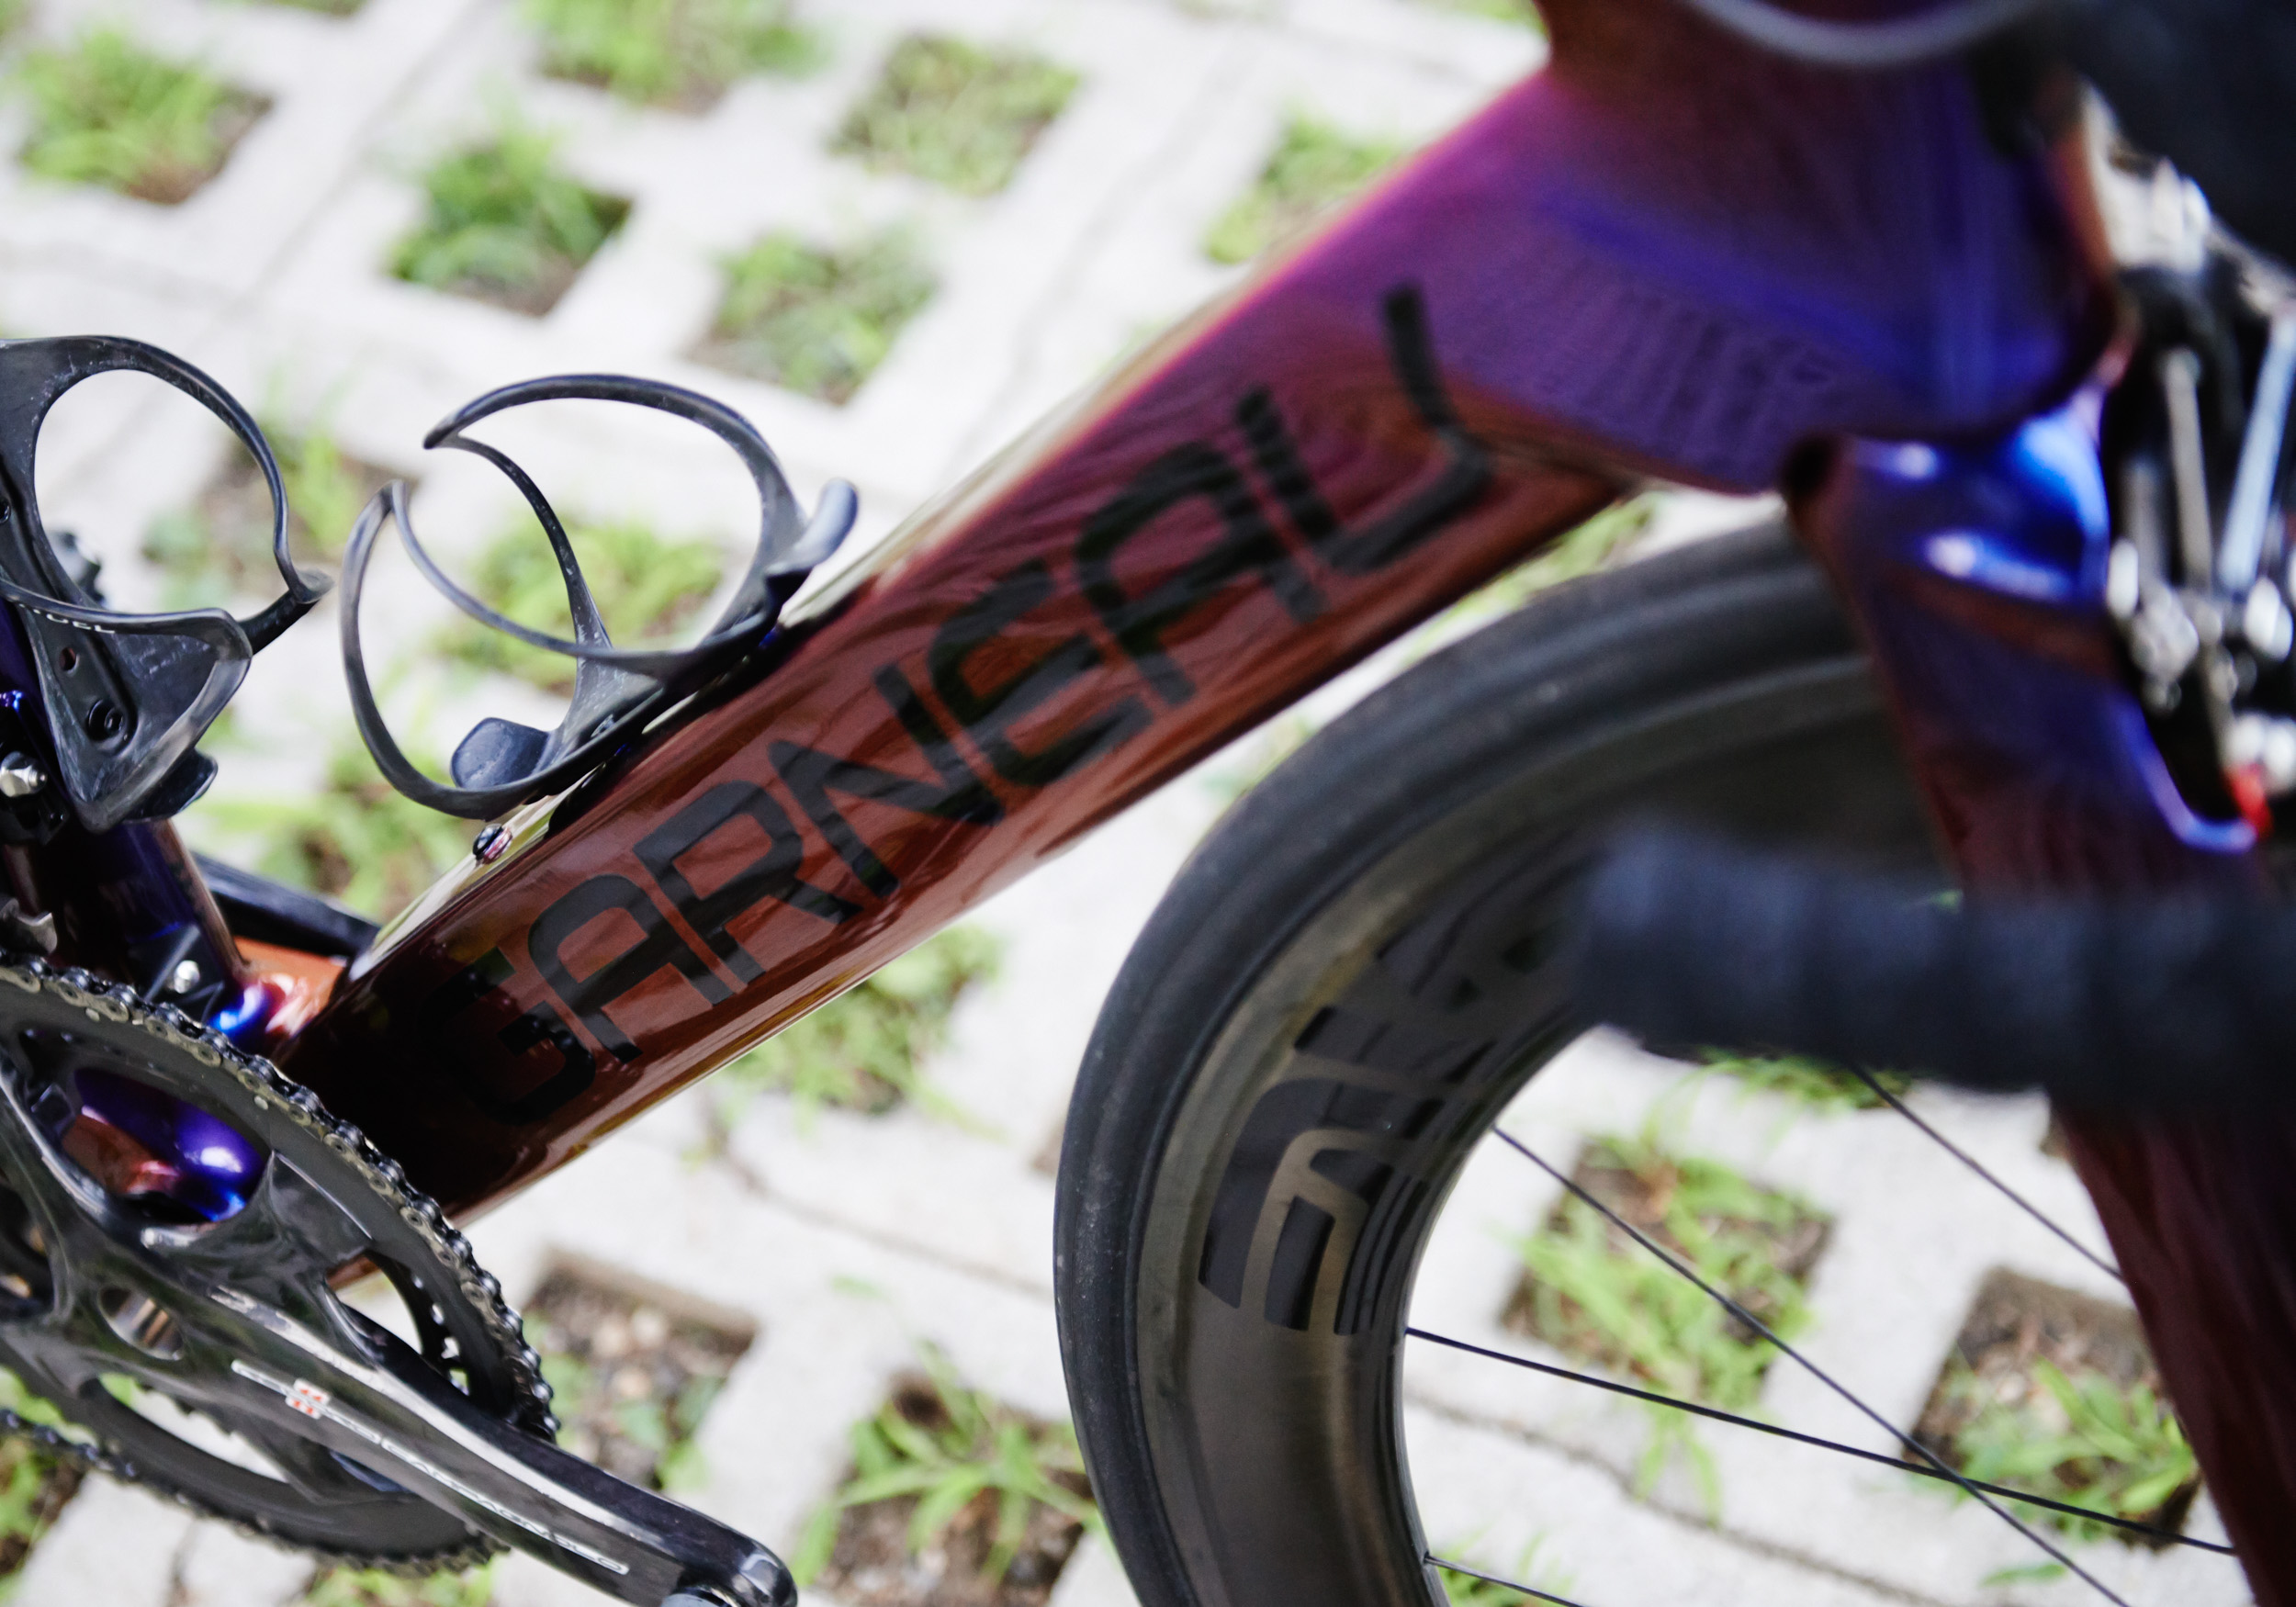 to-be-determined-garneau-a1-bike-review-126.jpg